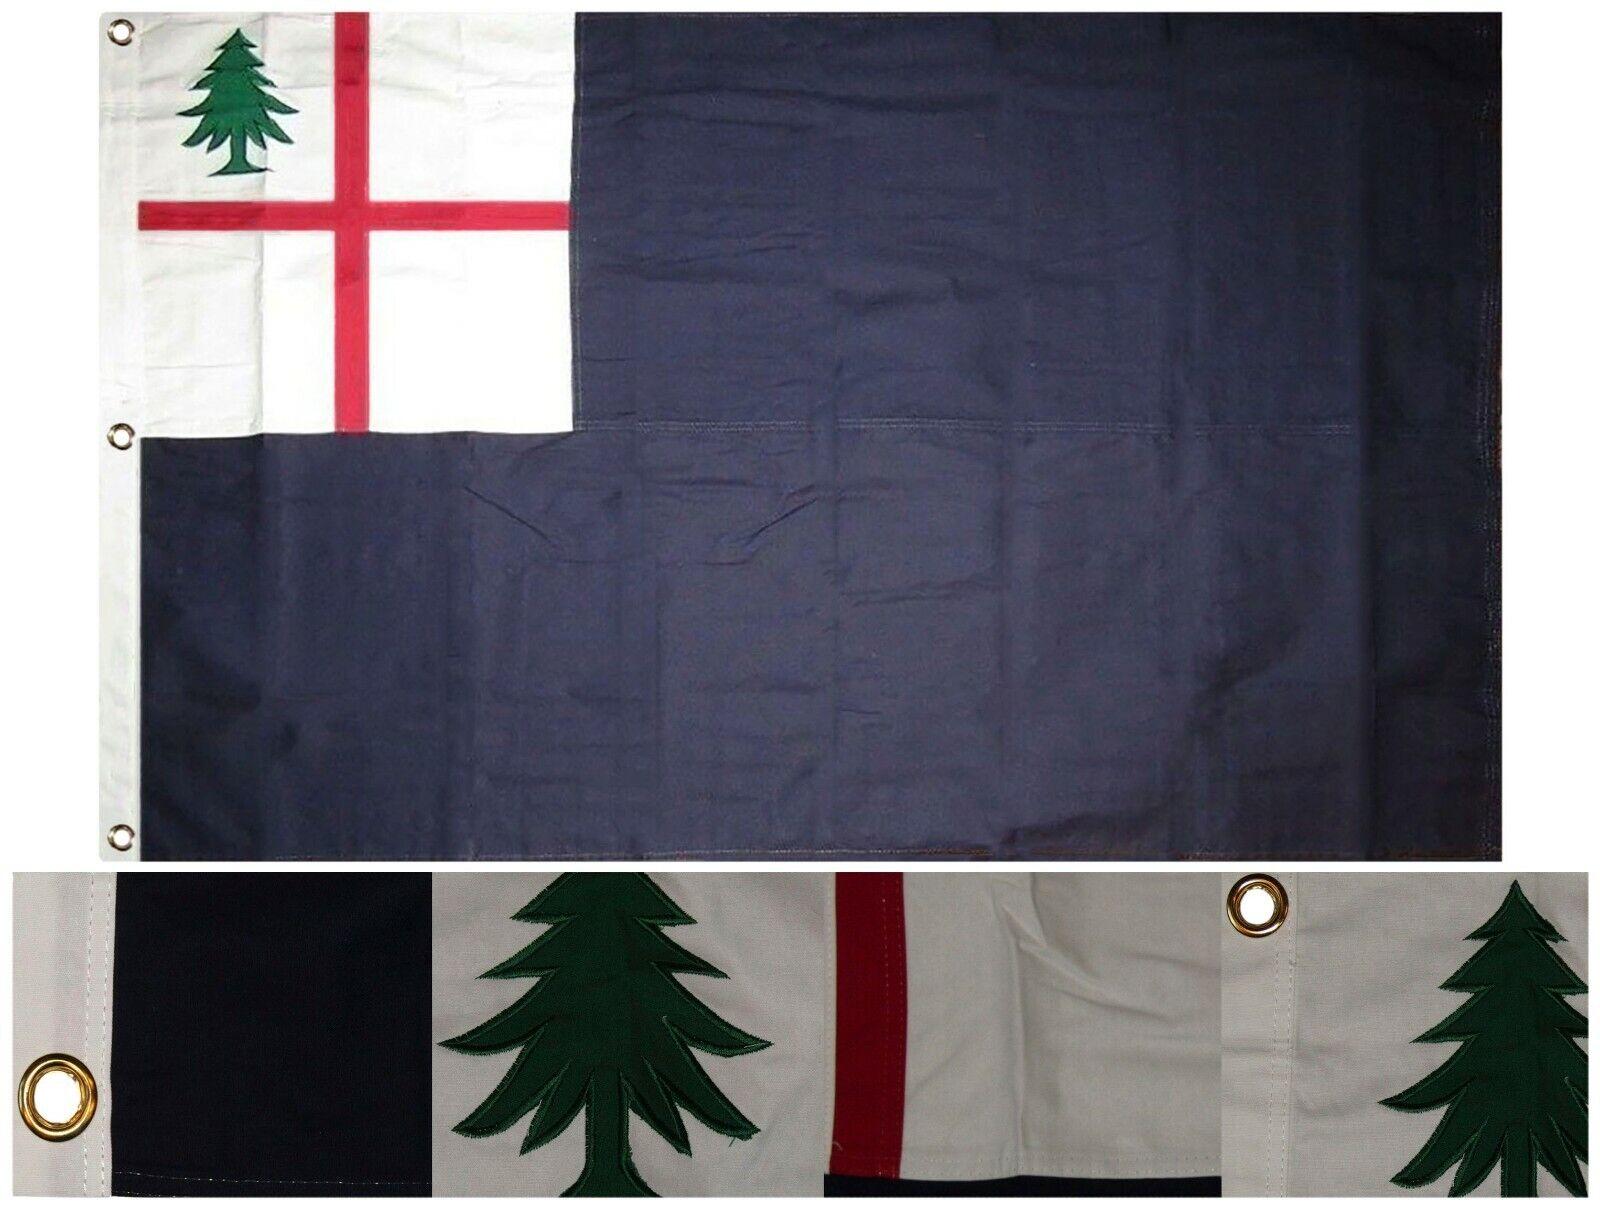 3x5 Bordado Cosidas Histórico Bunker Hill 100% Cotton Flag 0.9mx5 ' 3 Clips